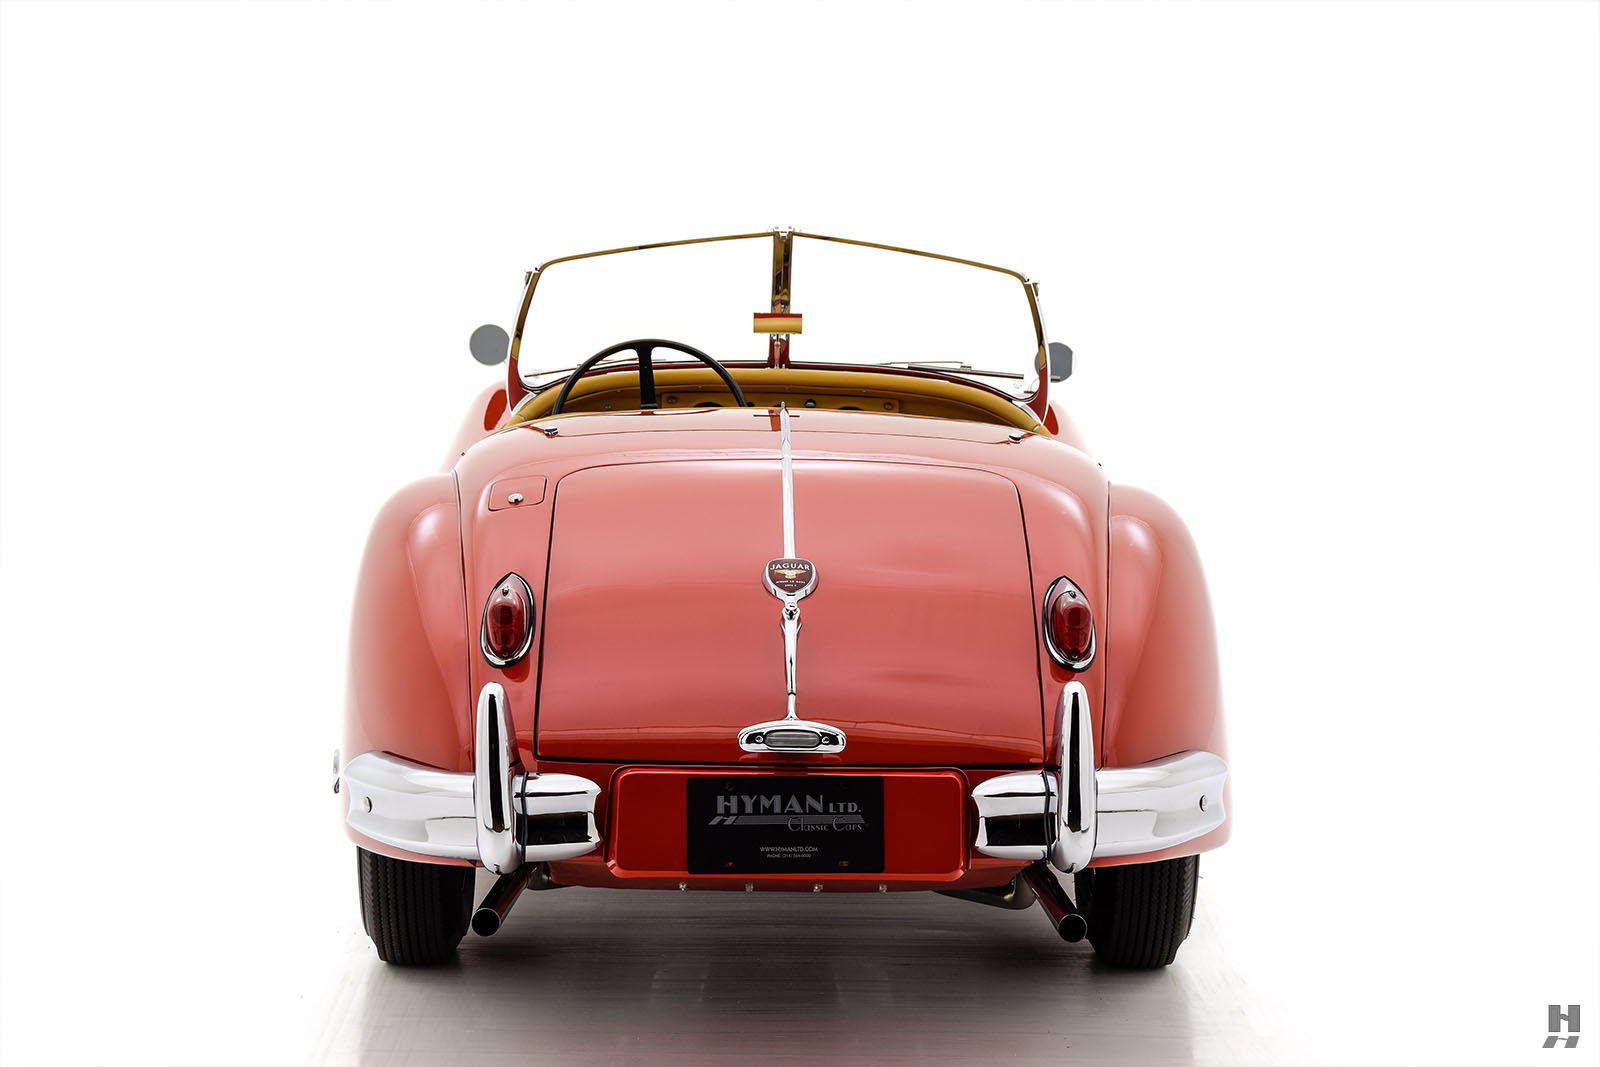 1957 Jaguar Xk140 Mc Roadster For Sale Buy Classic Cars Hyman Ltd